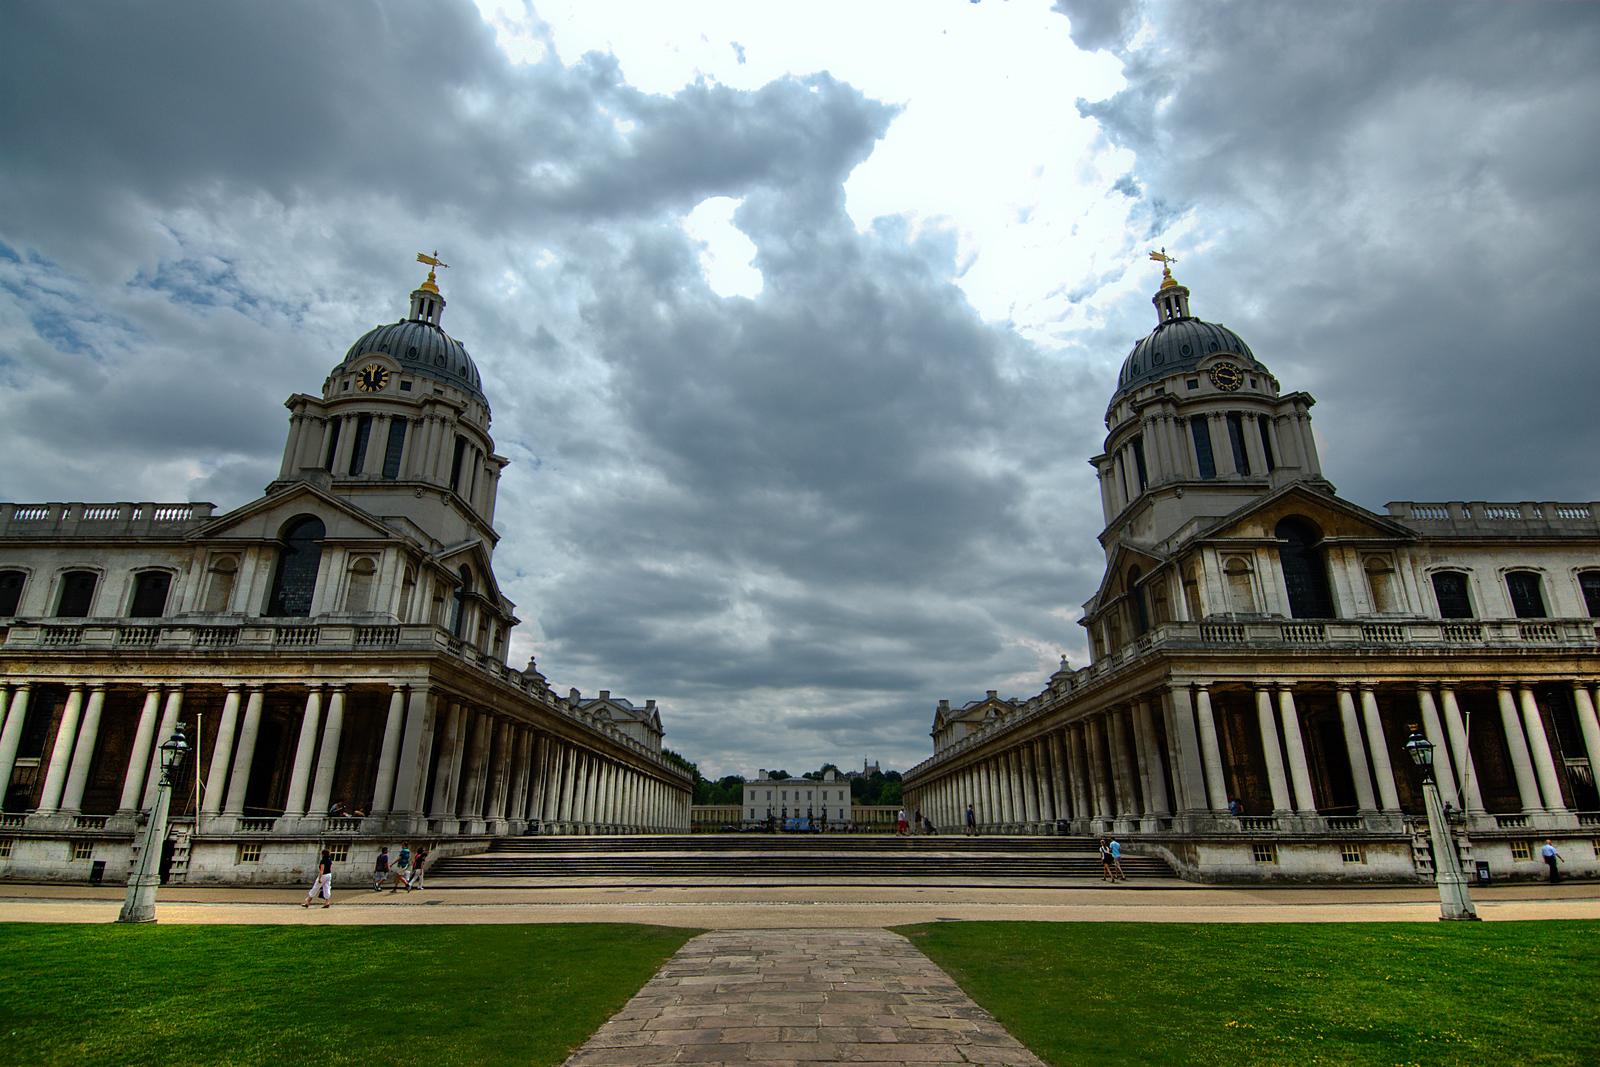 Maritime Greenwich UNESCO World Heritage Site, London